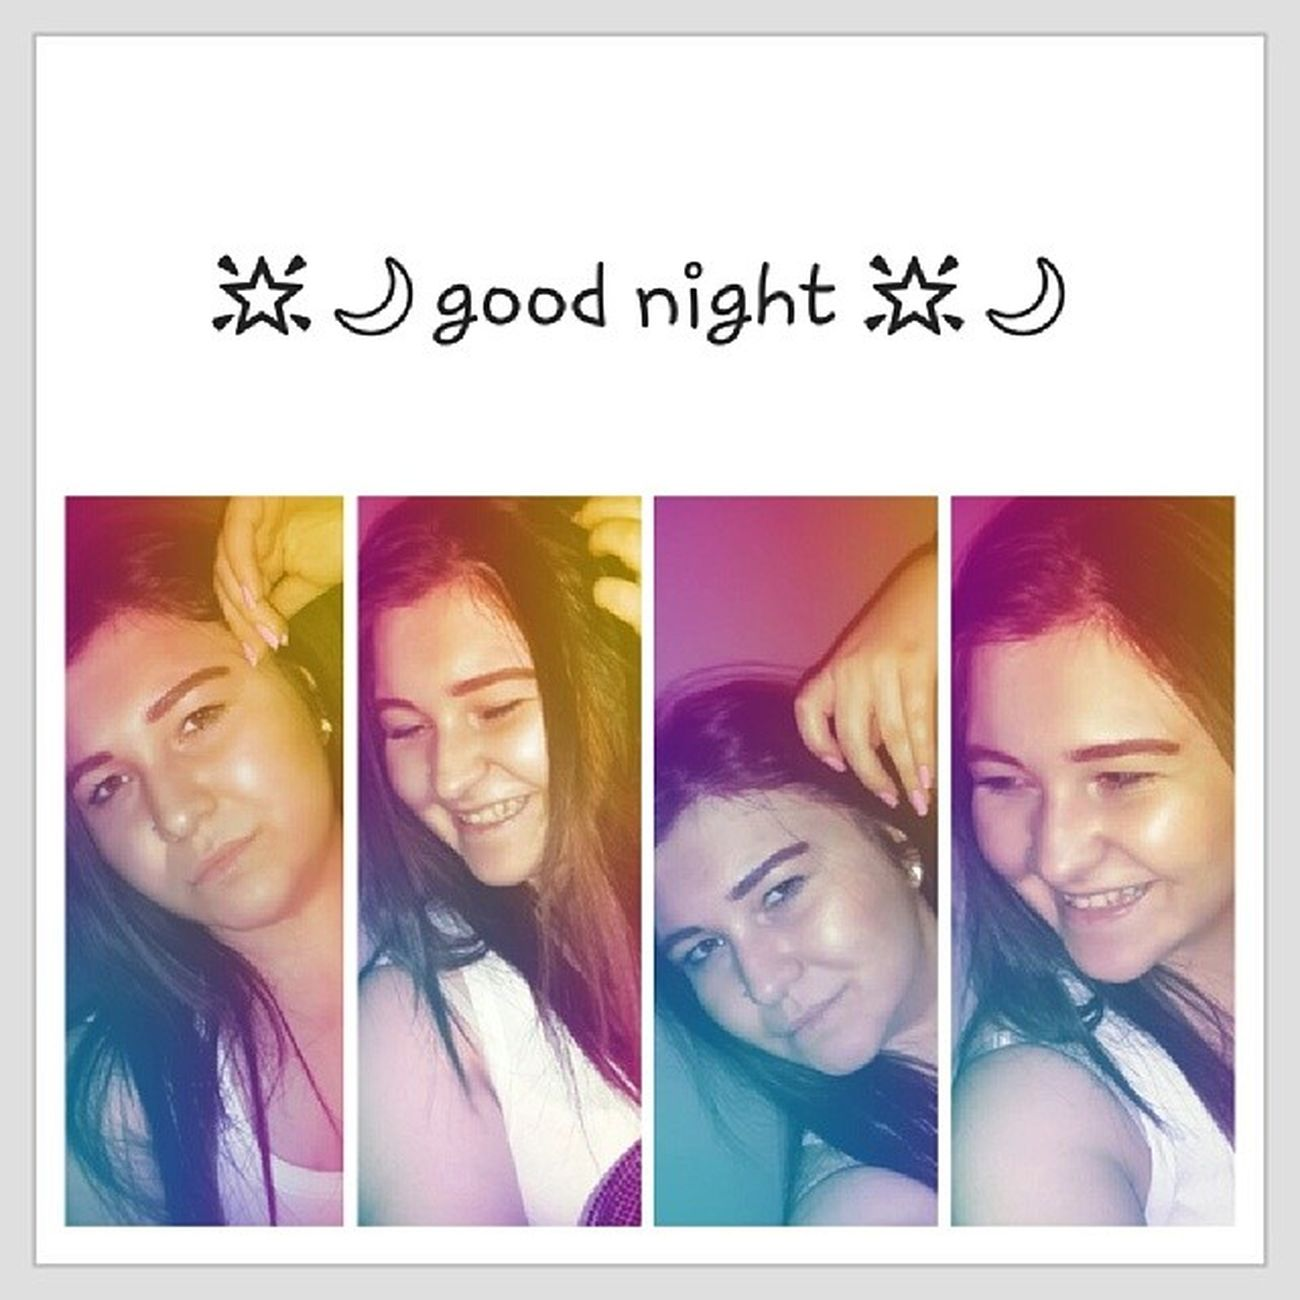 Goog night World Happy Love instamood instalove instagood instamag naturel smile enjoy ??????